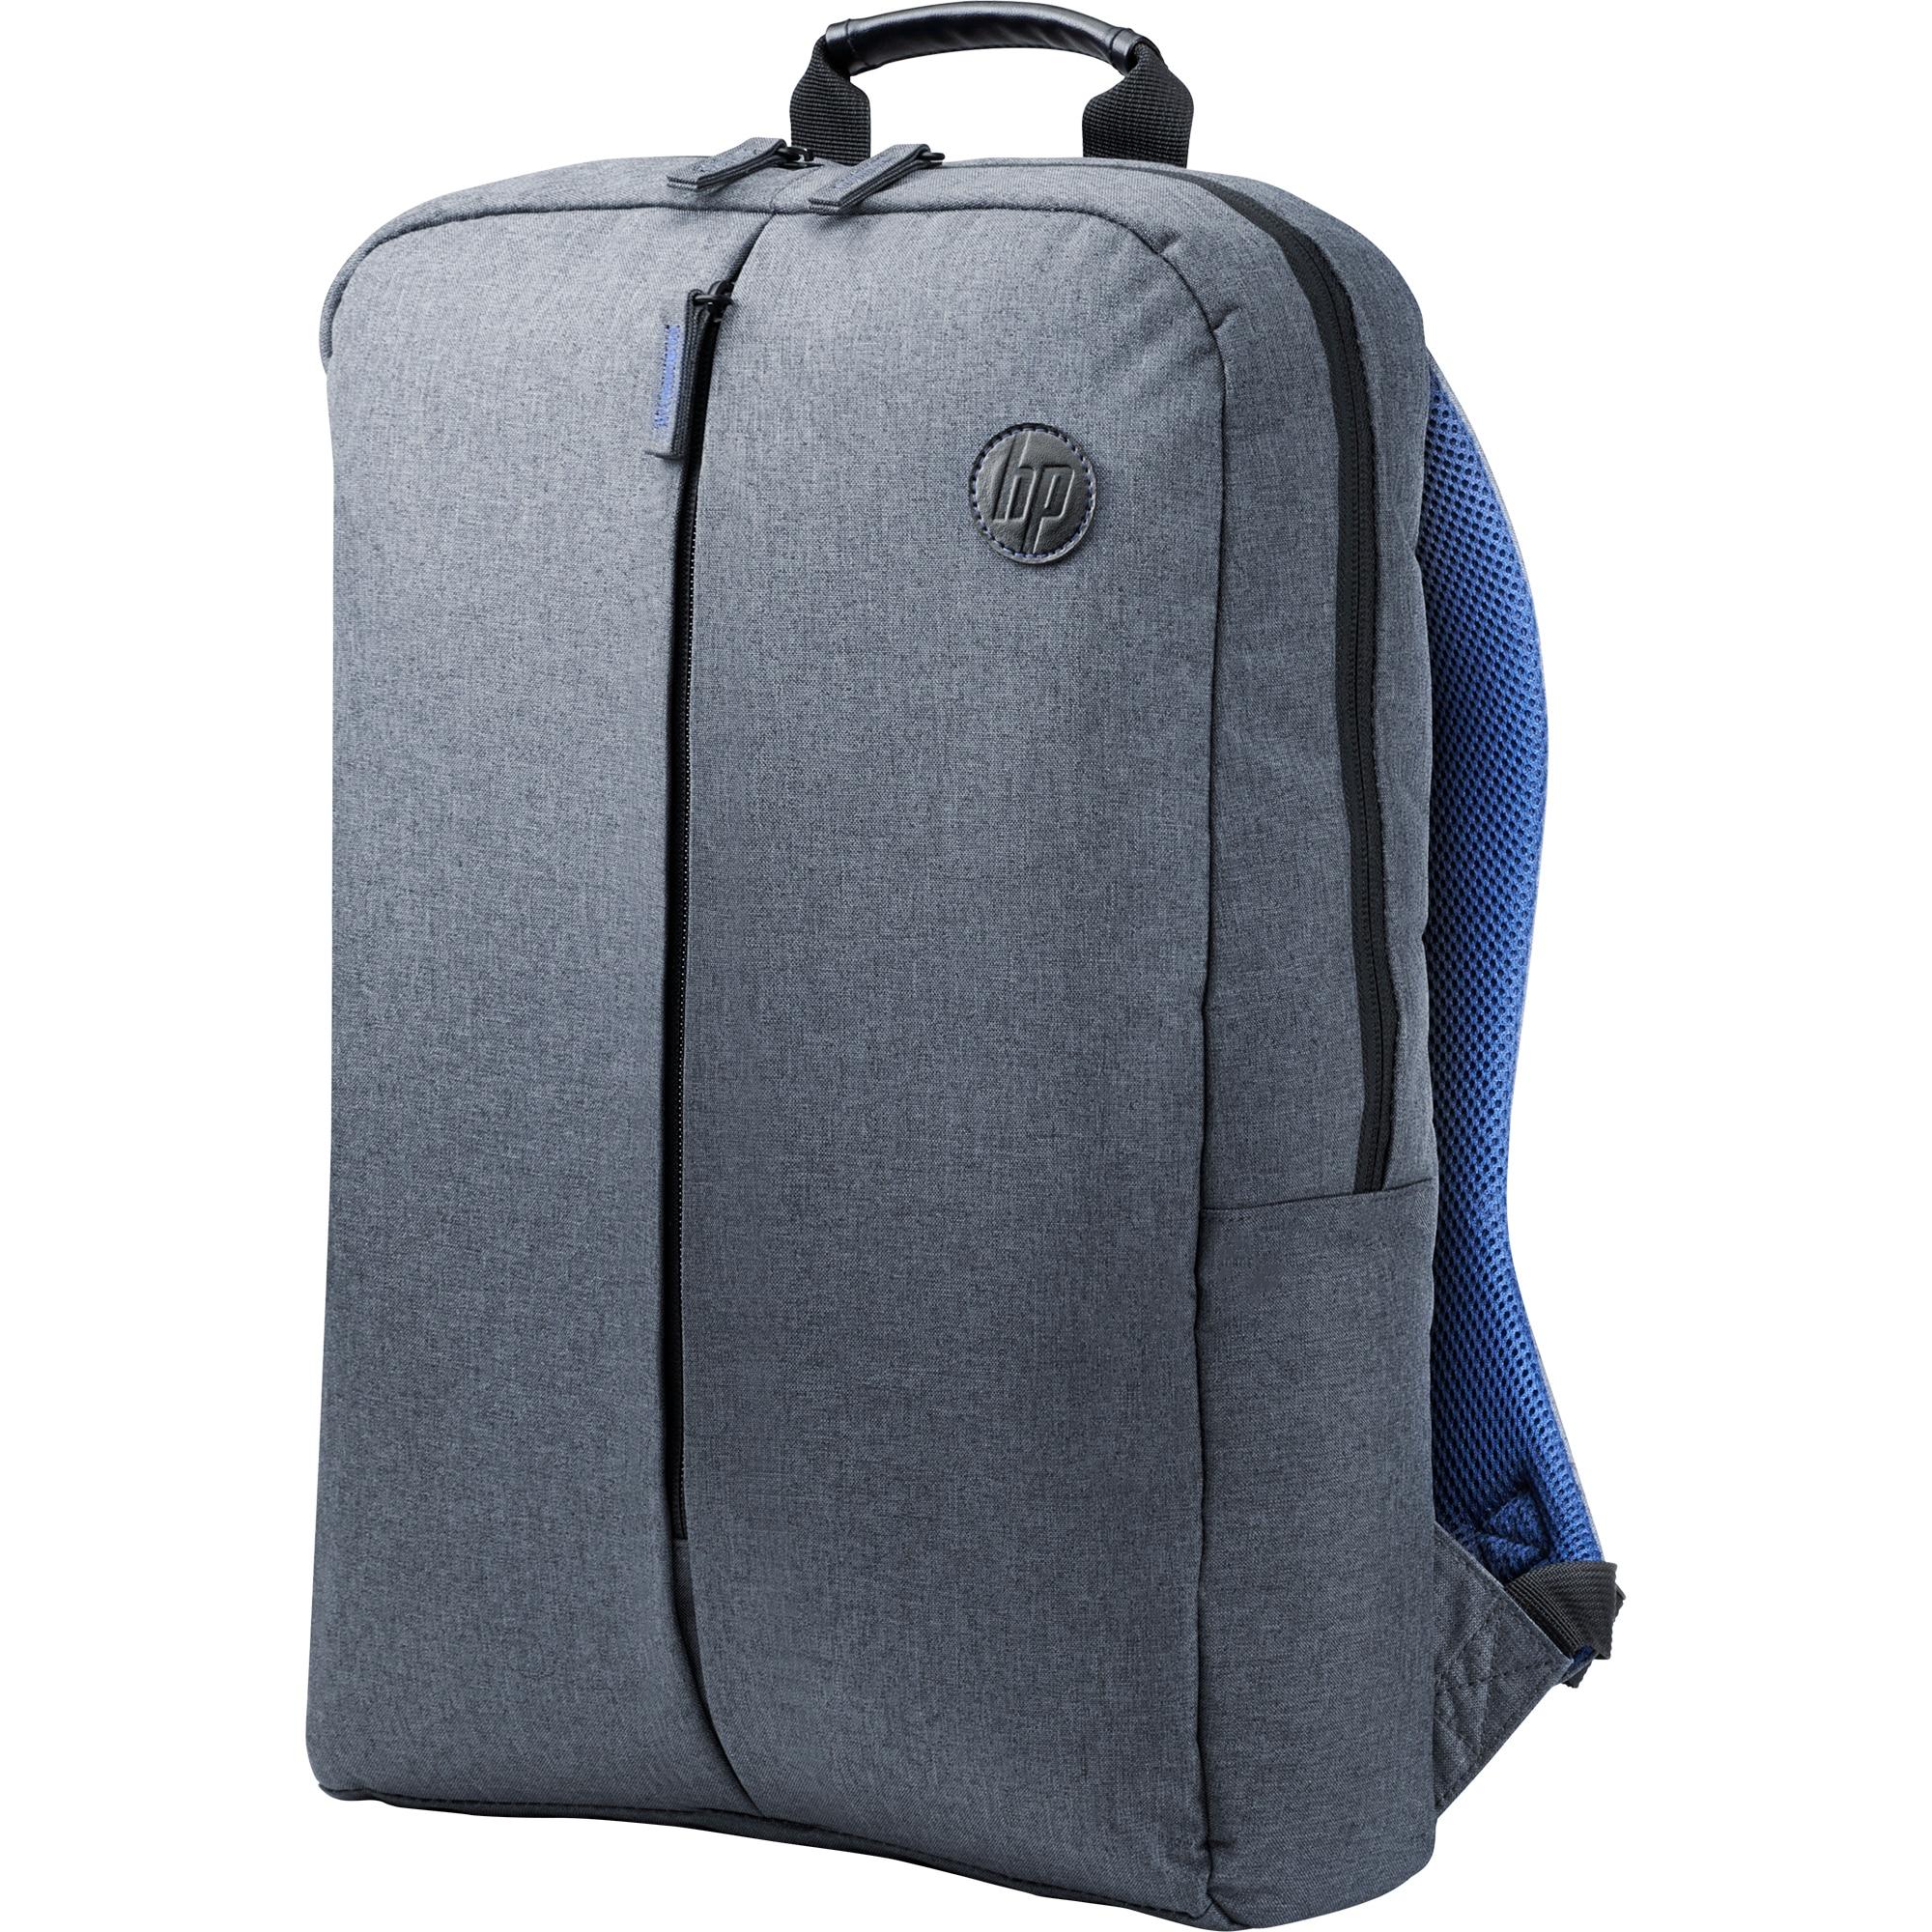 "Fotografie Rucsac Laptop HP Value, 15.6"", Gri"